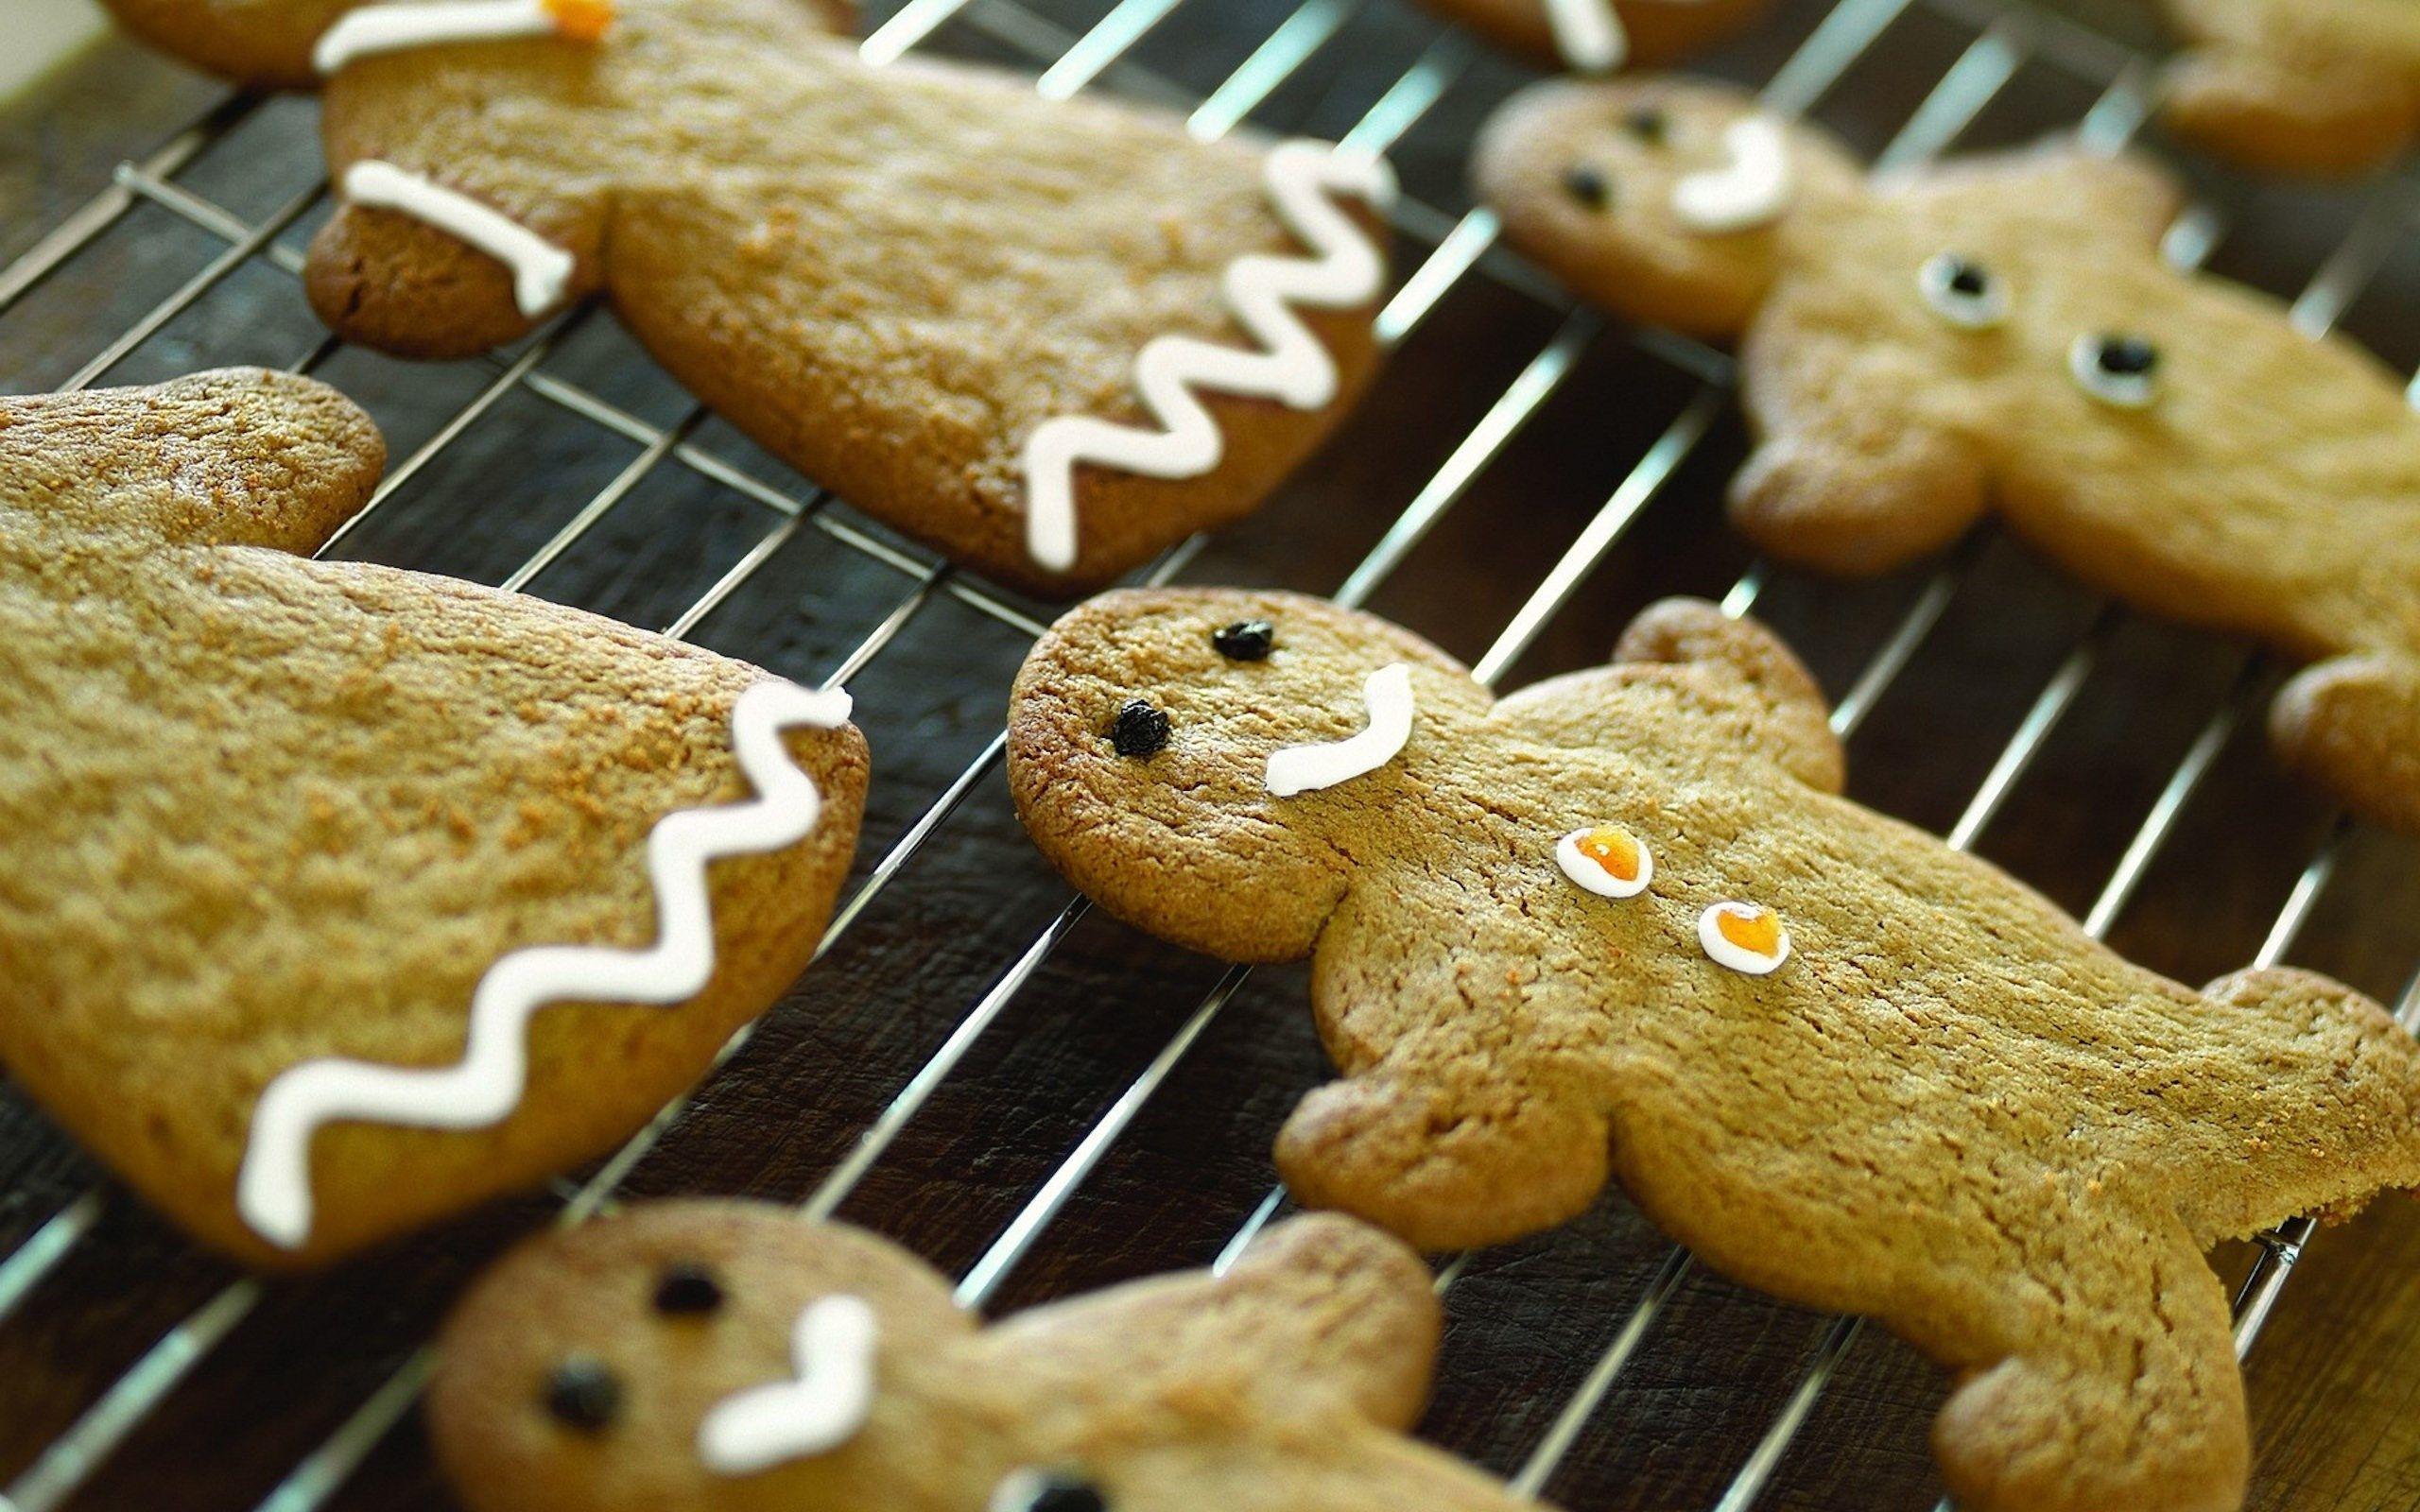 gingerbread man screensavers backgrounds, 991 kB - Collis Grant